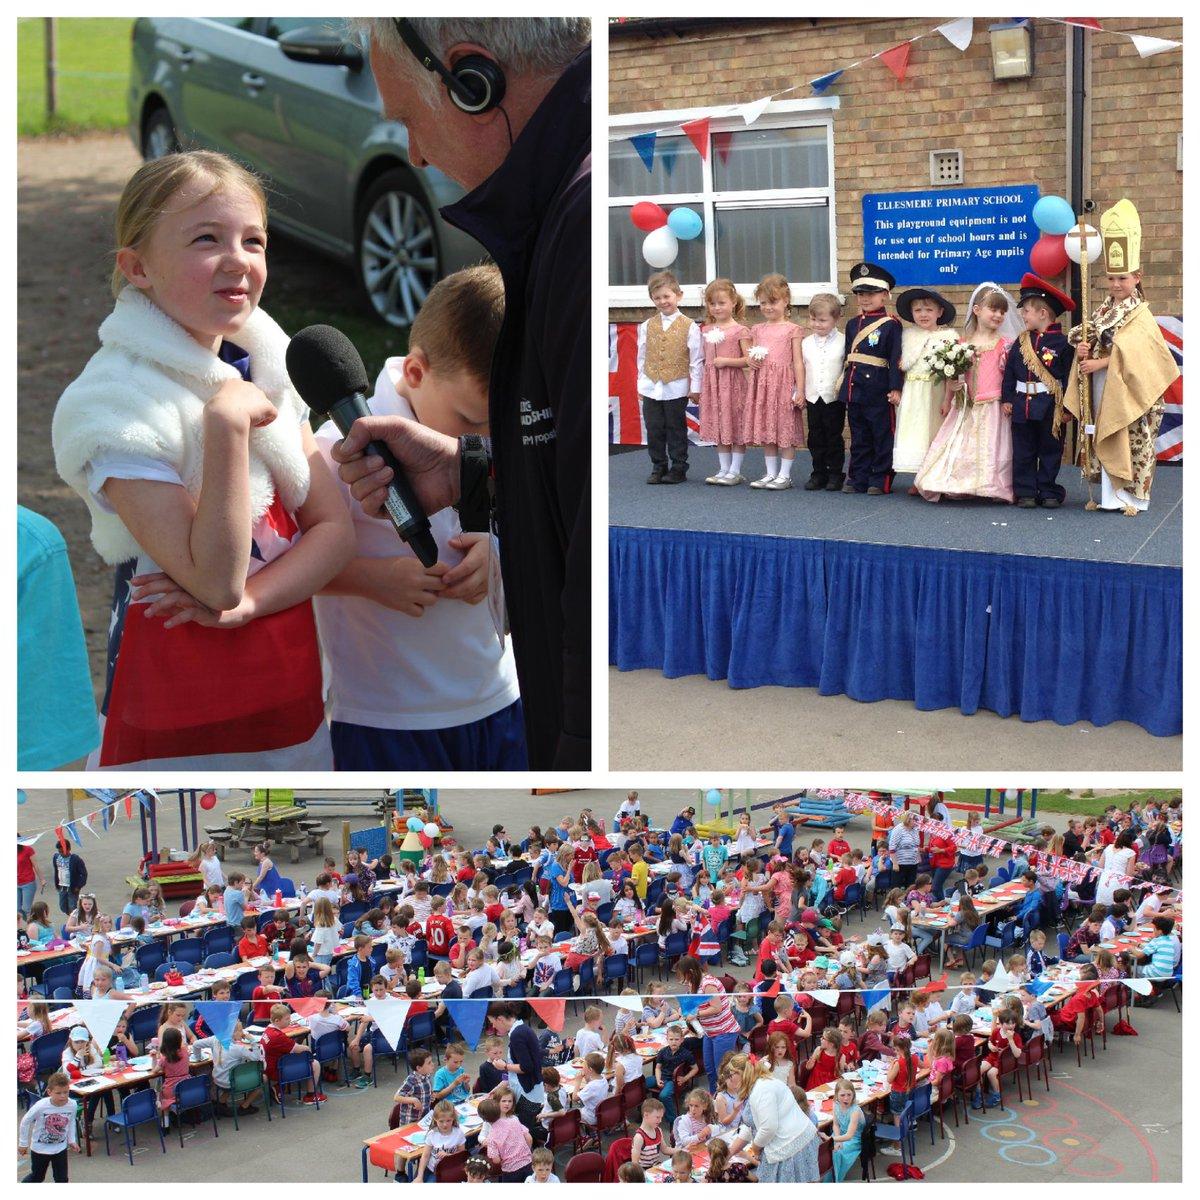 TV and radio descended on @EllesmerePS to give them a taste of the #royalwedding limelight! CLICK>> https://t.co/7JMME9Hoqk